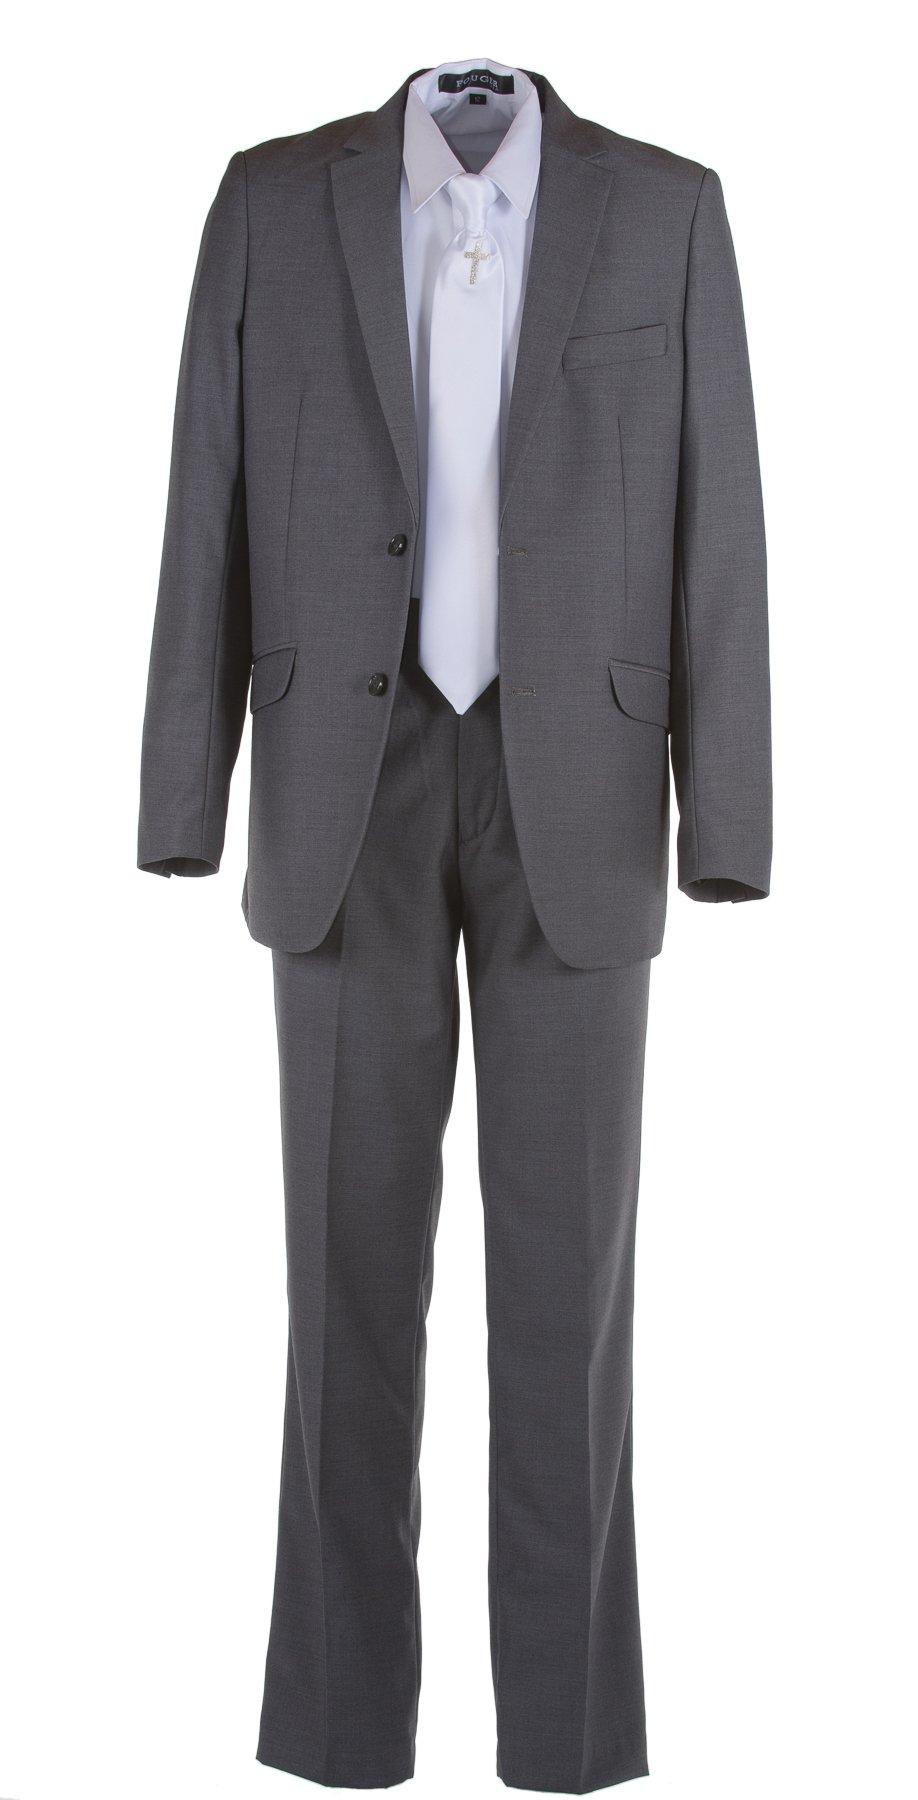 Tuxgear Boys Dark Grey Slim Fit Communion Suit With Silver Cross Dress Tie (Boys 7)